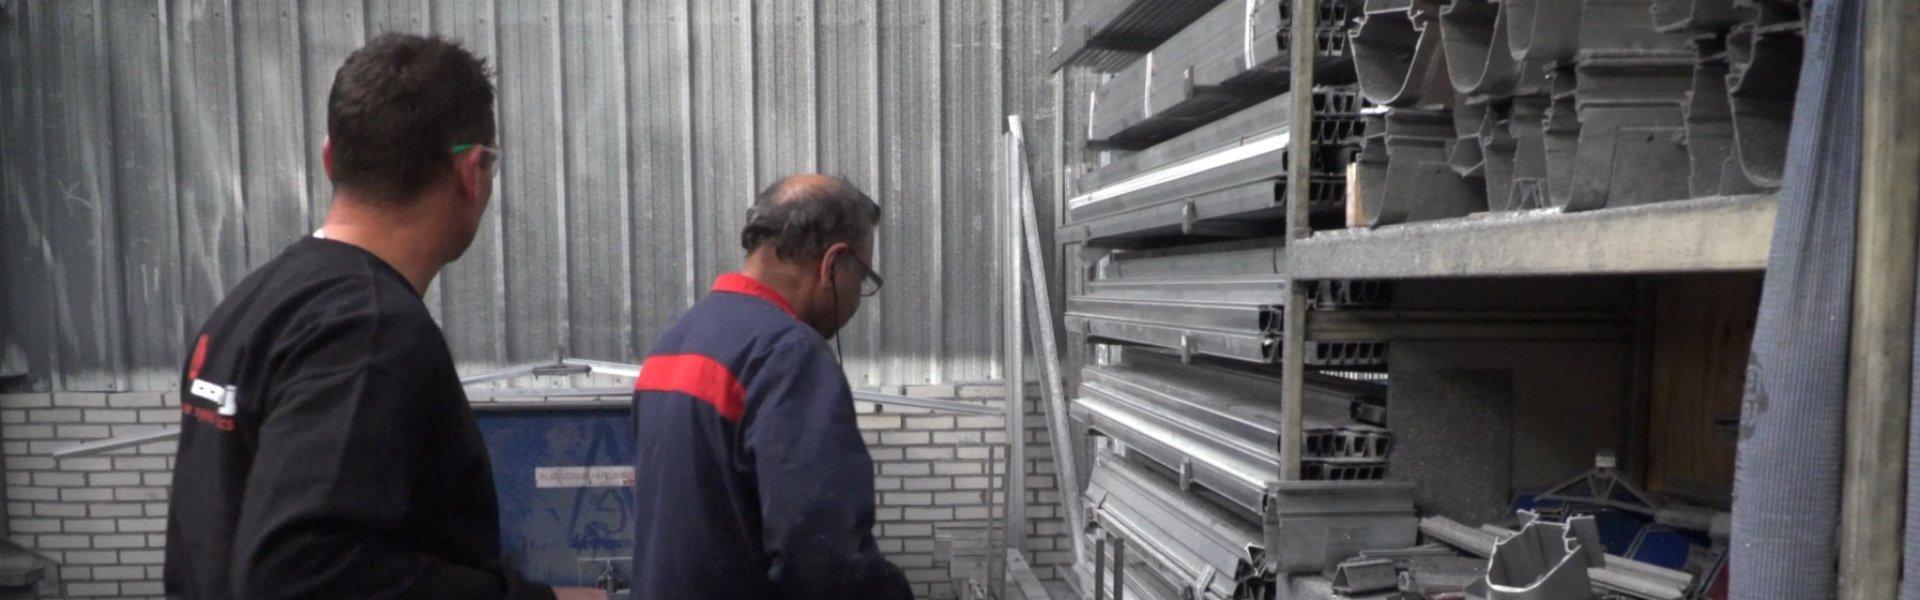 Productieleider